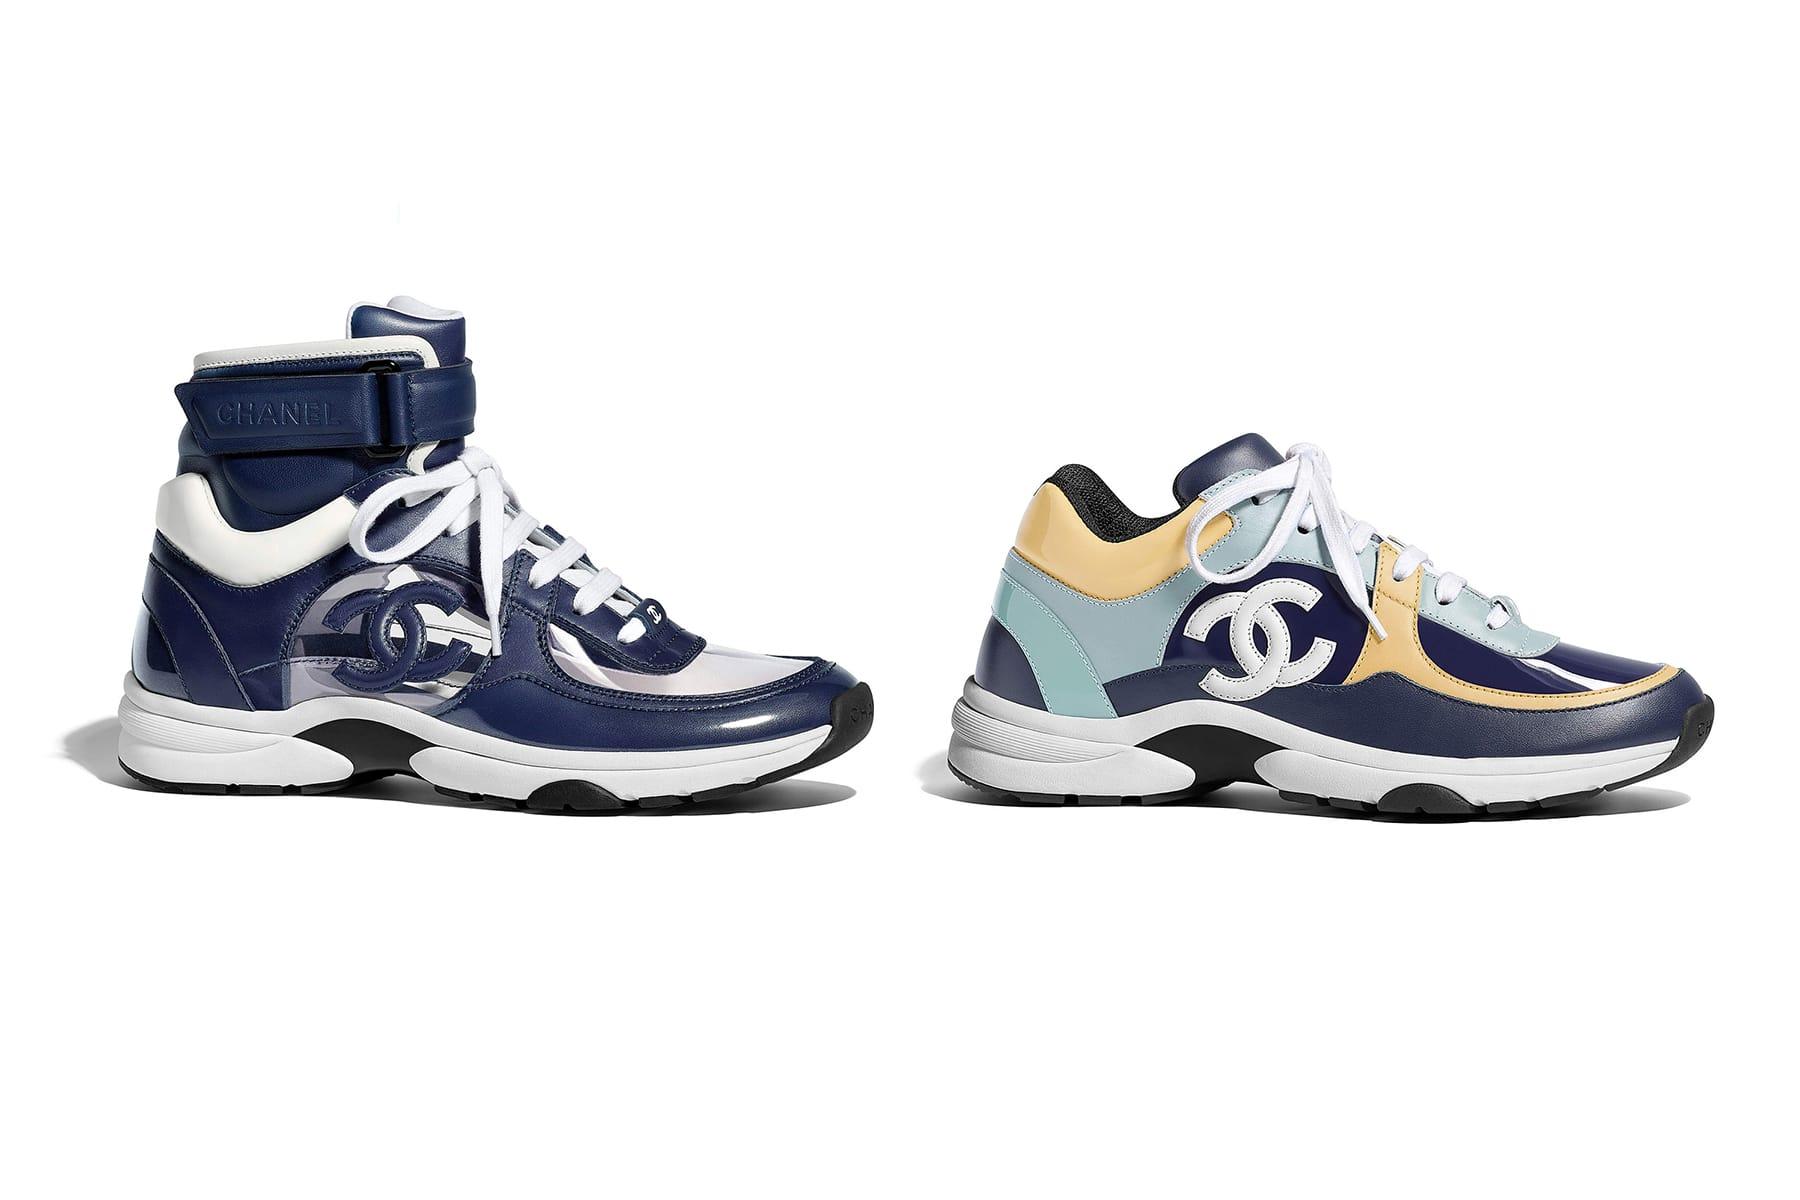 Chanel Spring/Summer 2018 Sneaker